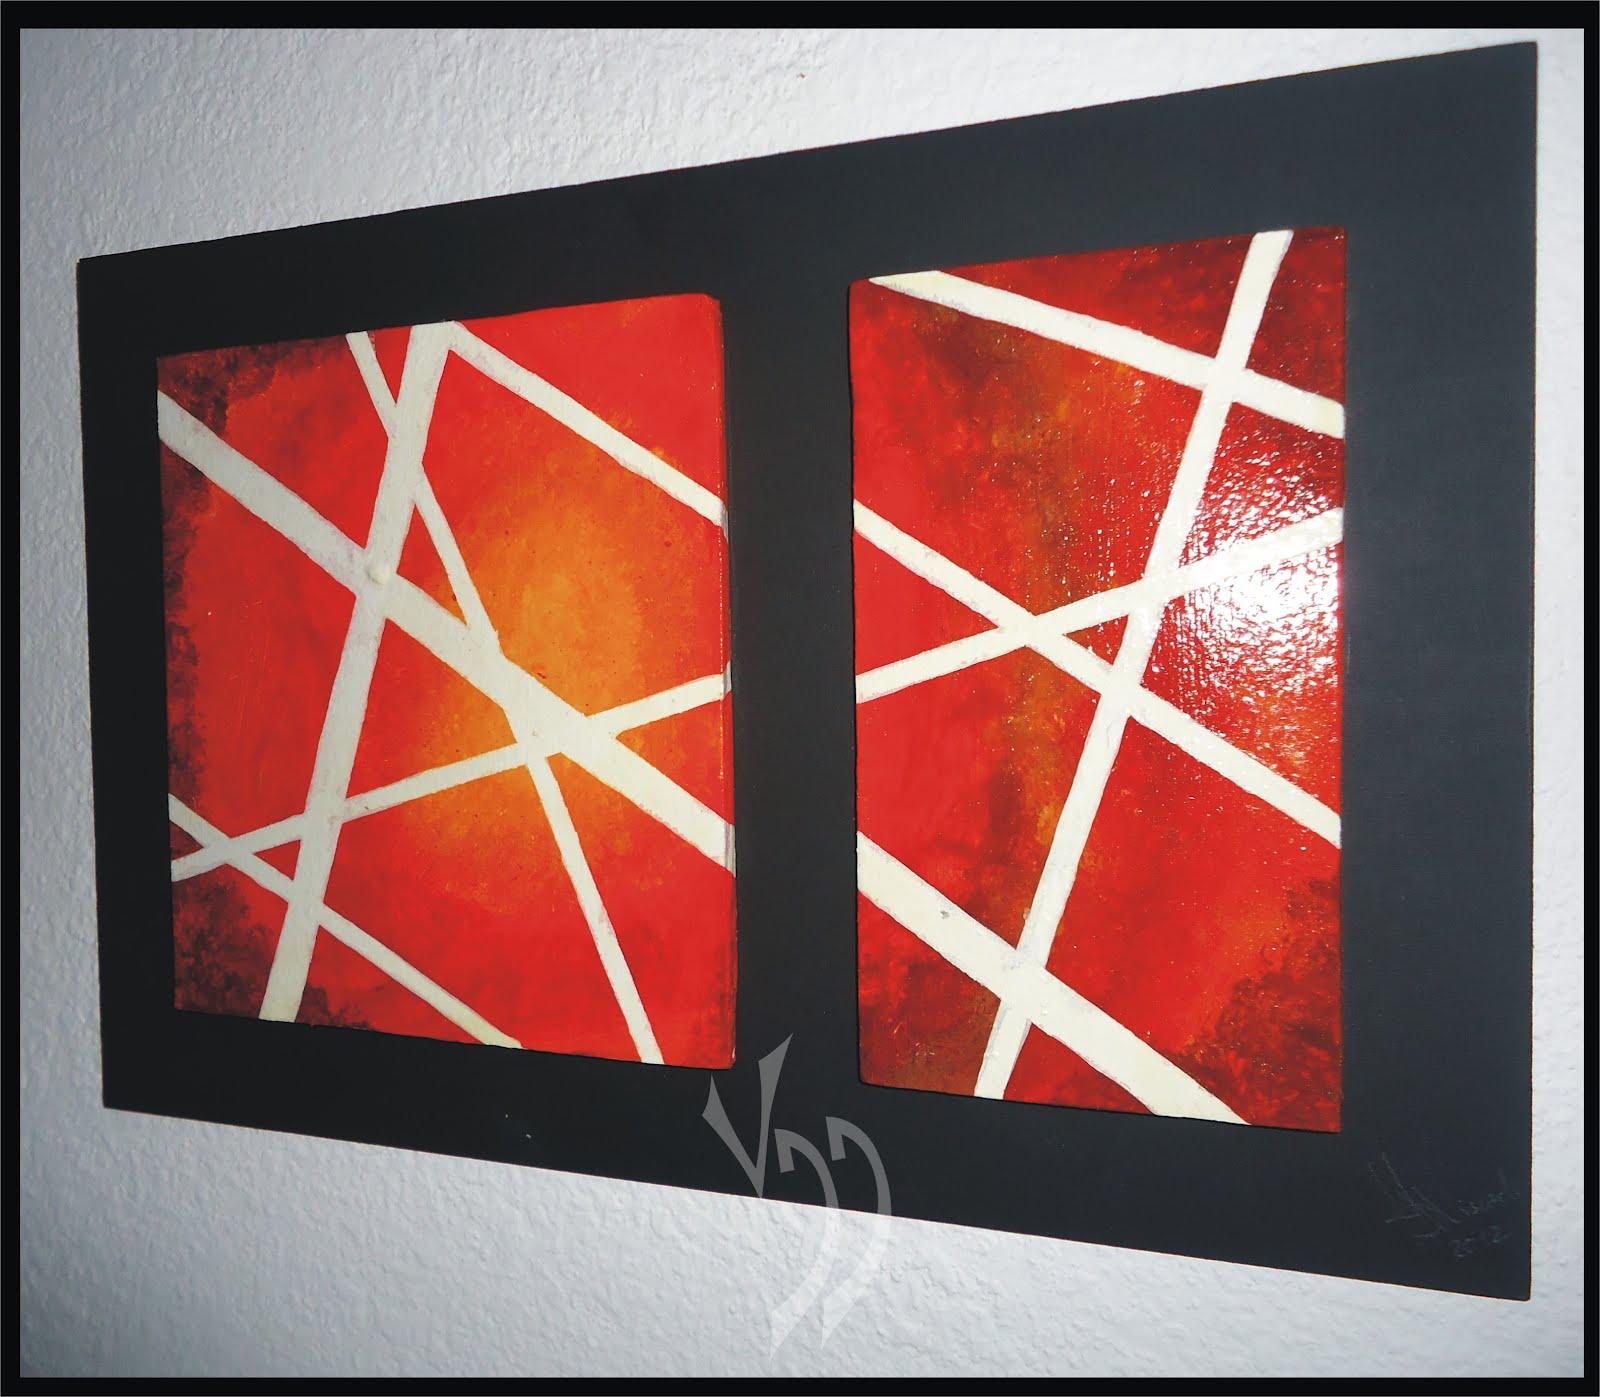 Cuadros abstractos abstractos mm mondrian i car interior for Fotos cuadros abstractos